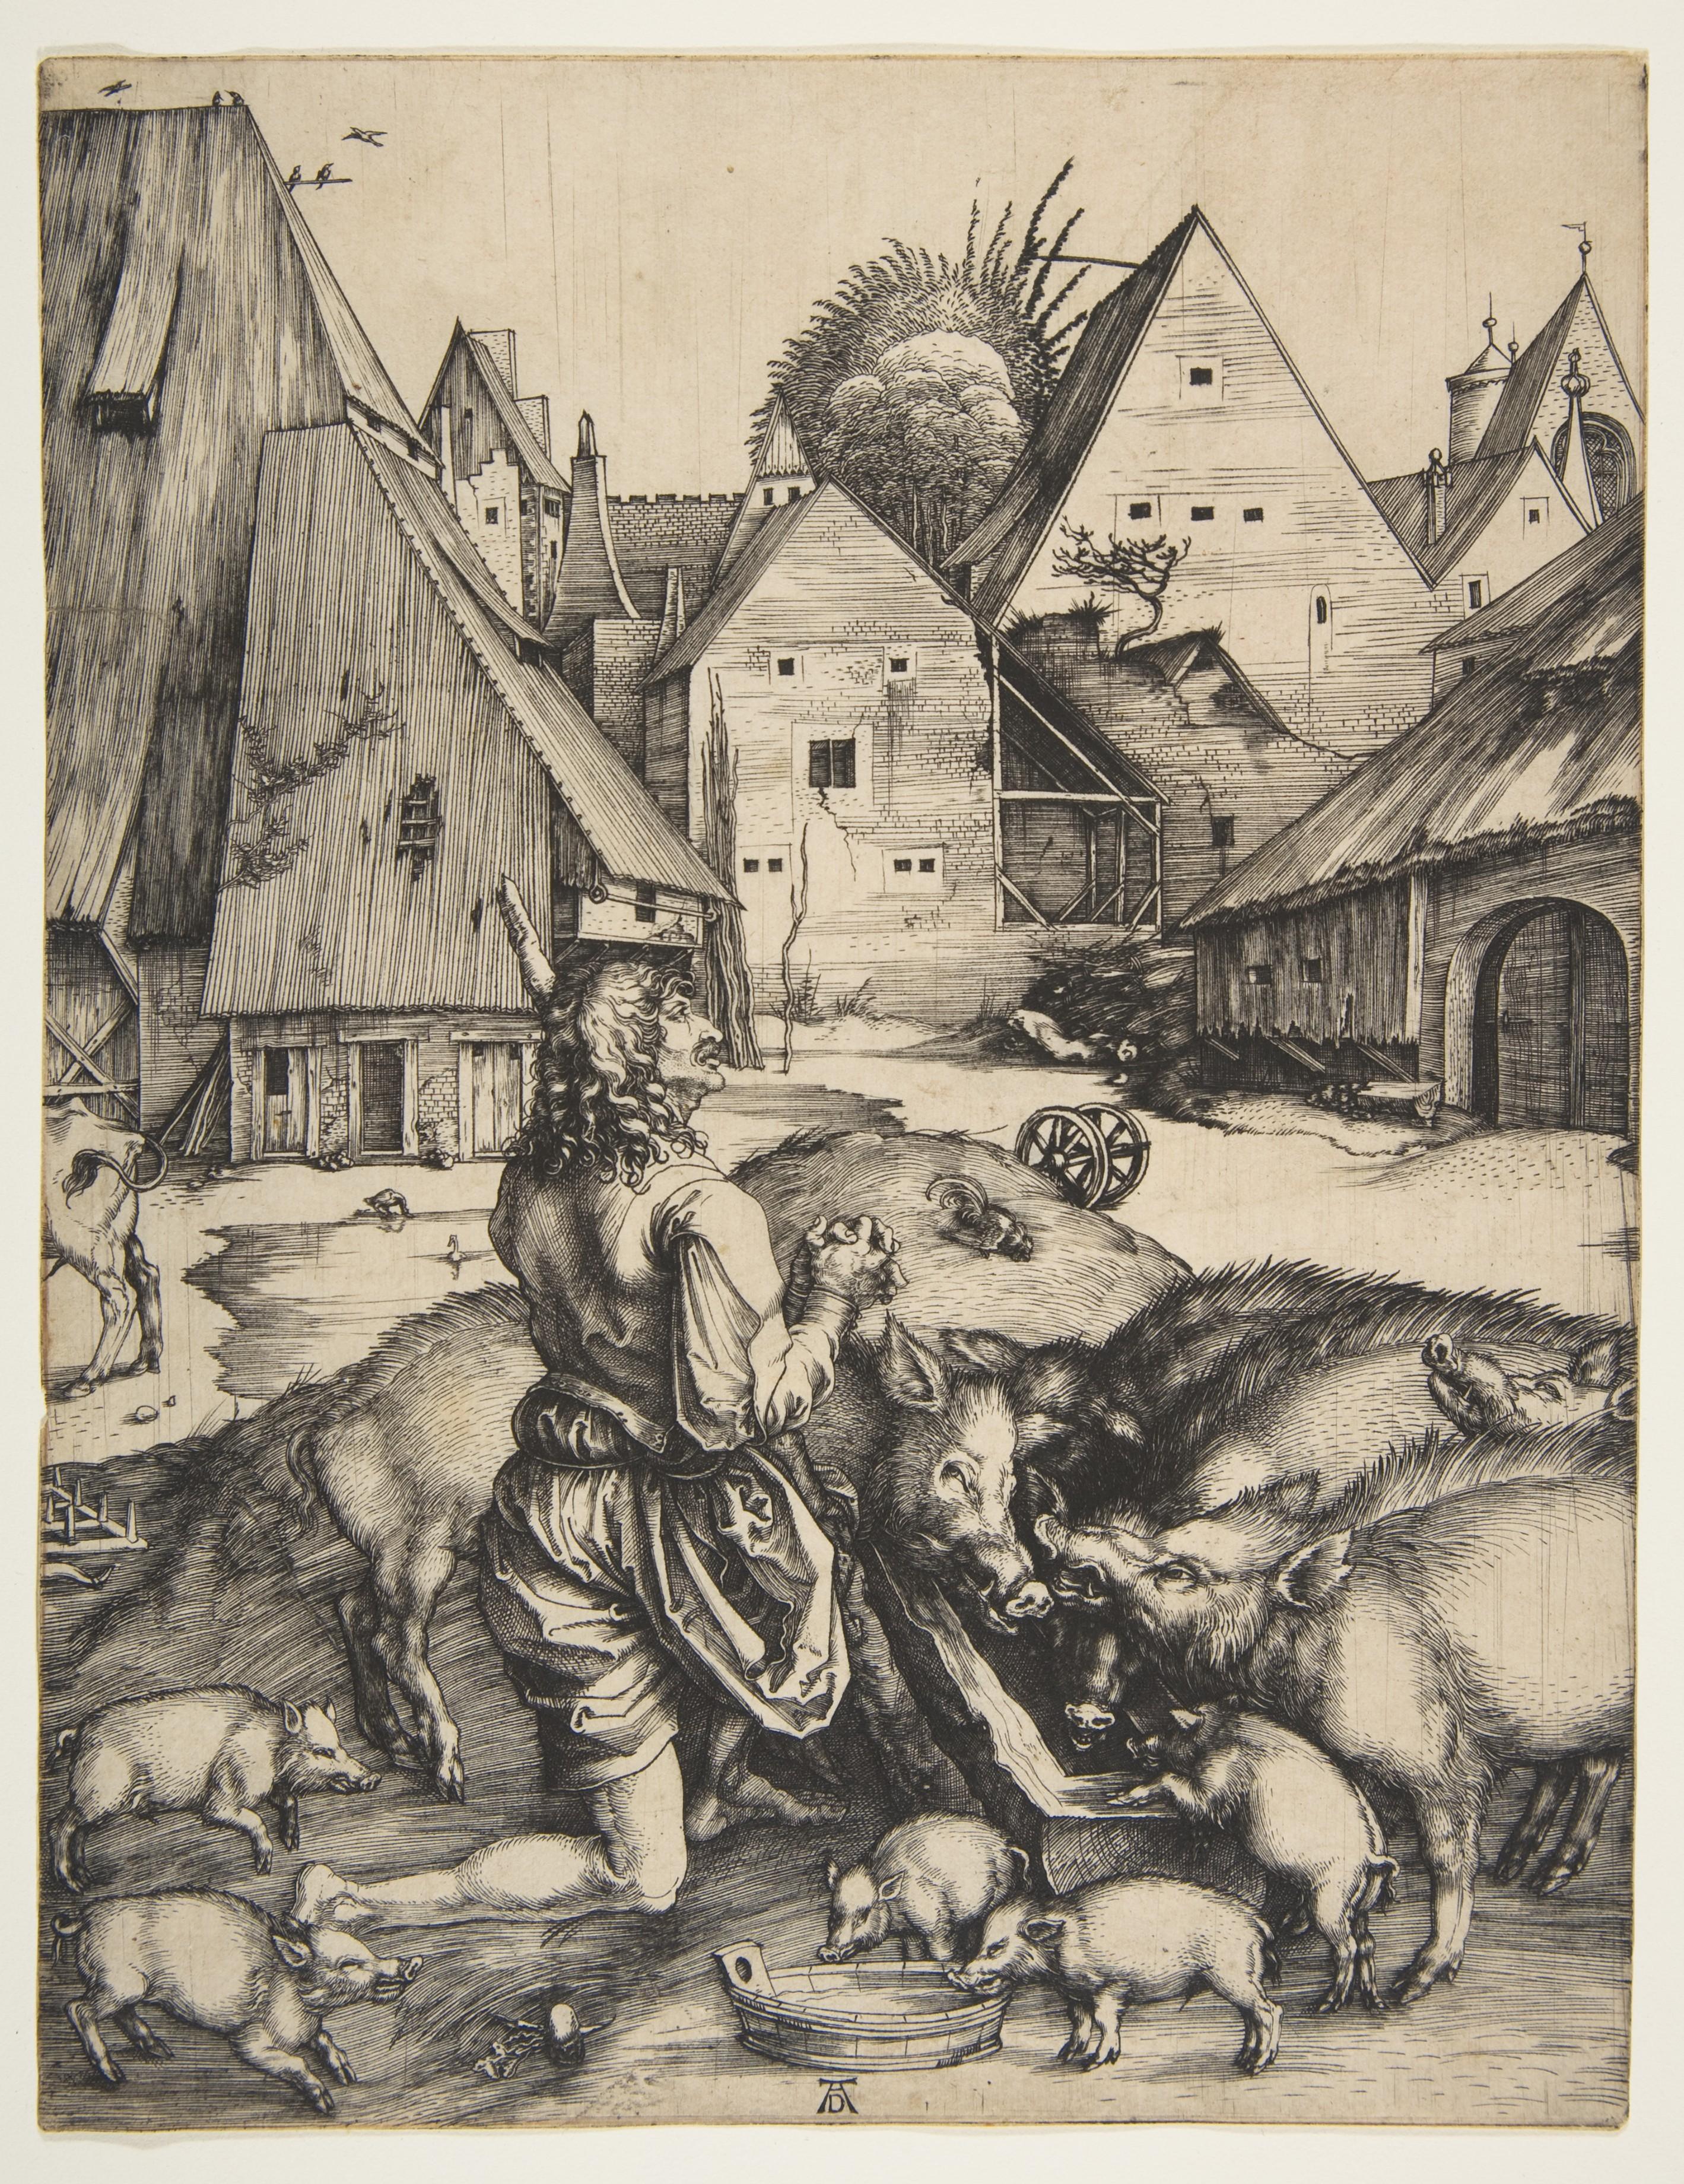 Albrecht Durer The Prodigal Son The Met